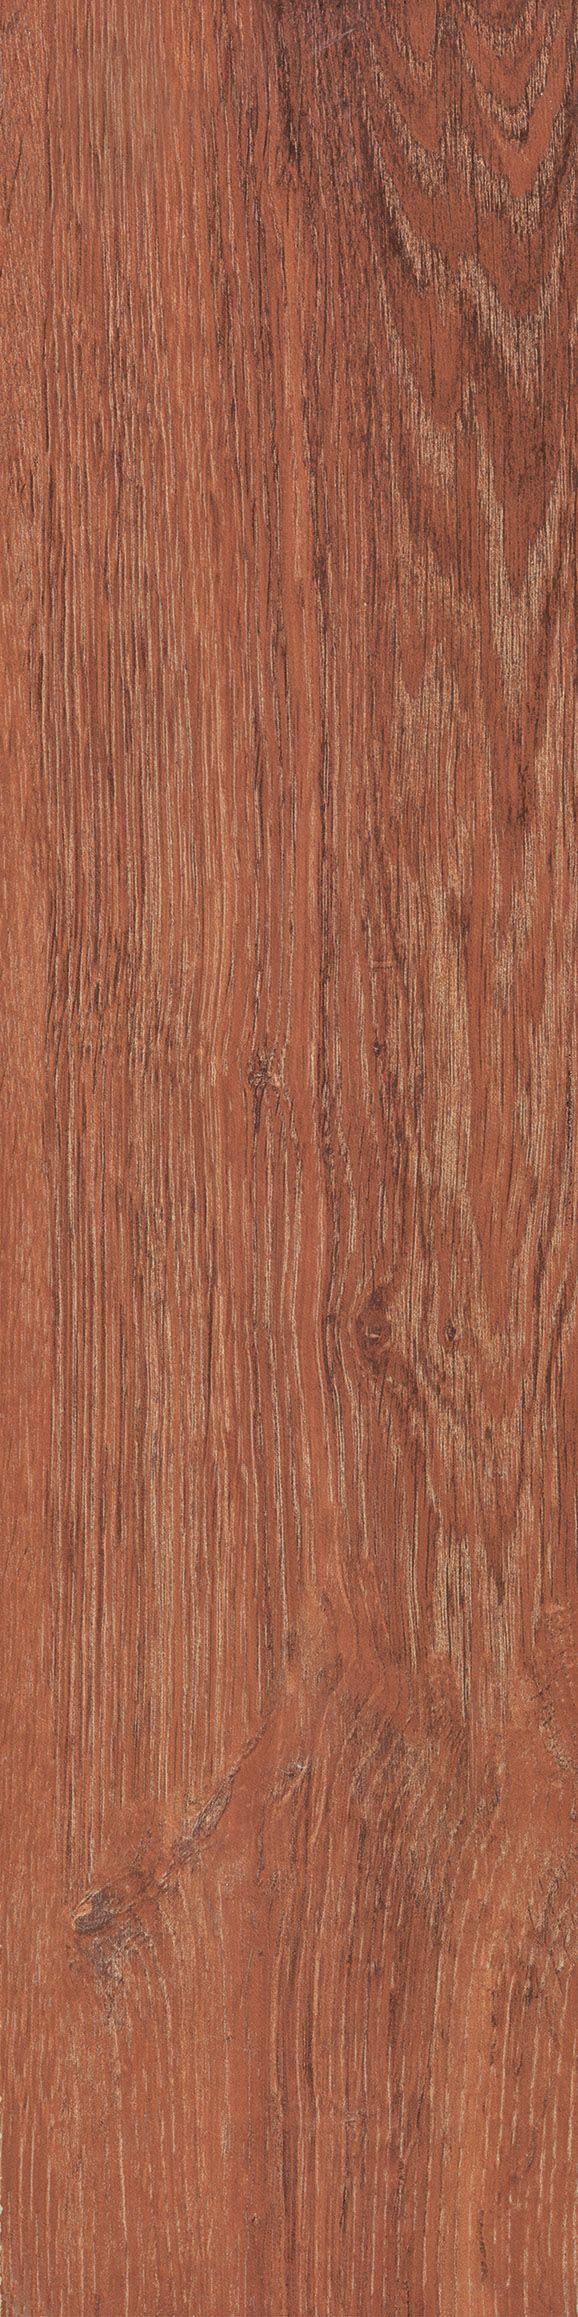 Grespania Canaima Cedro 15x60 porcelain wood effect floor tile